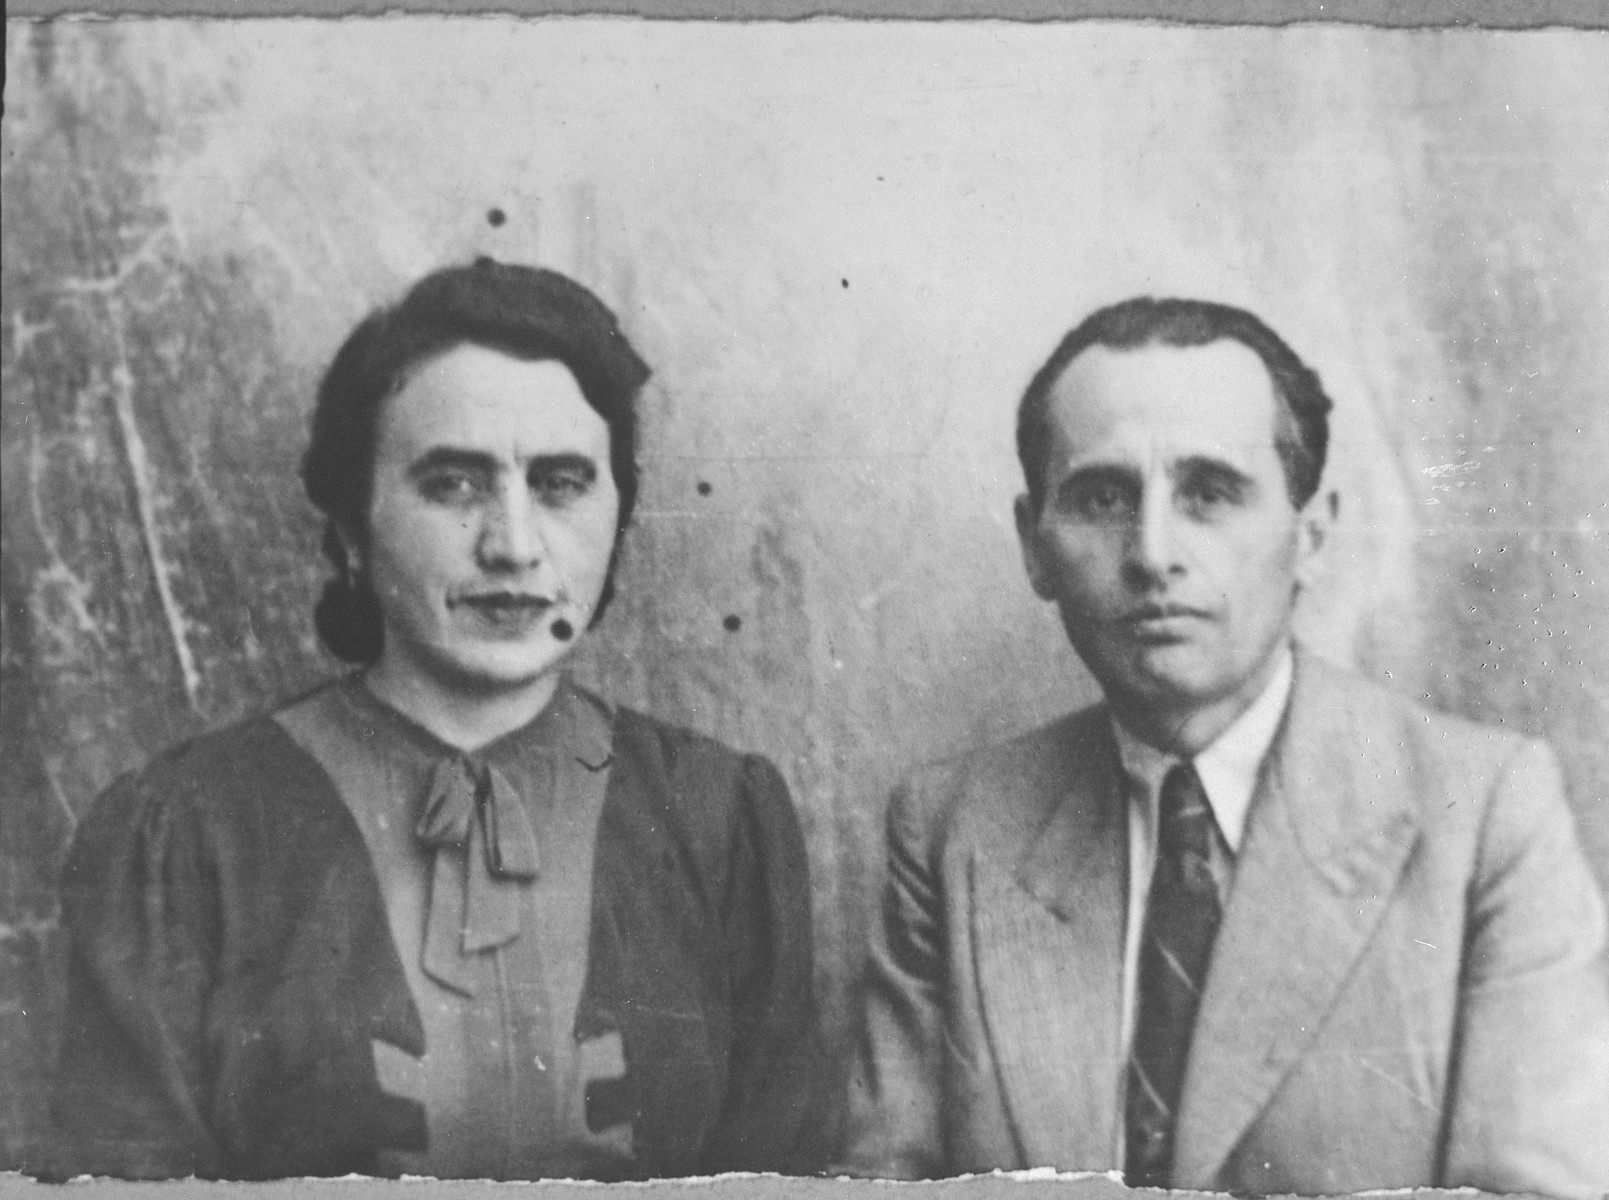 Portrait of Solomon Pardo, son of Mushon Pardo, and Solomon's wife, Regina.  Solomon was a grocer.  They lived at Karagoryeva 56 in Bitola.